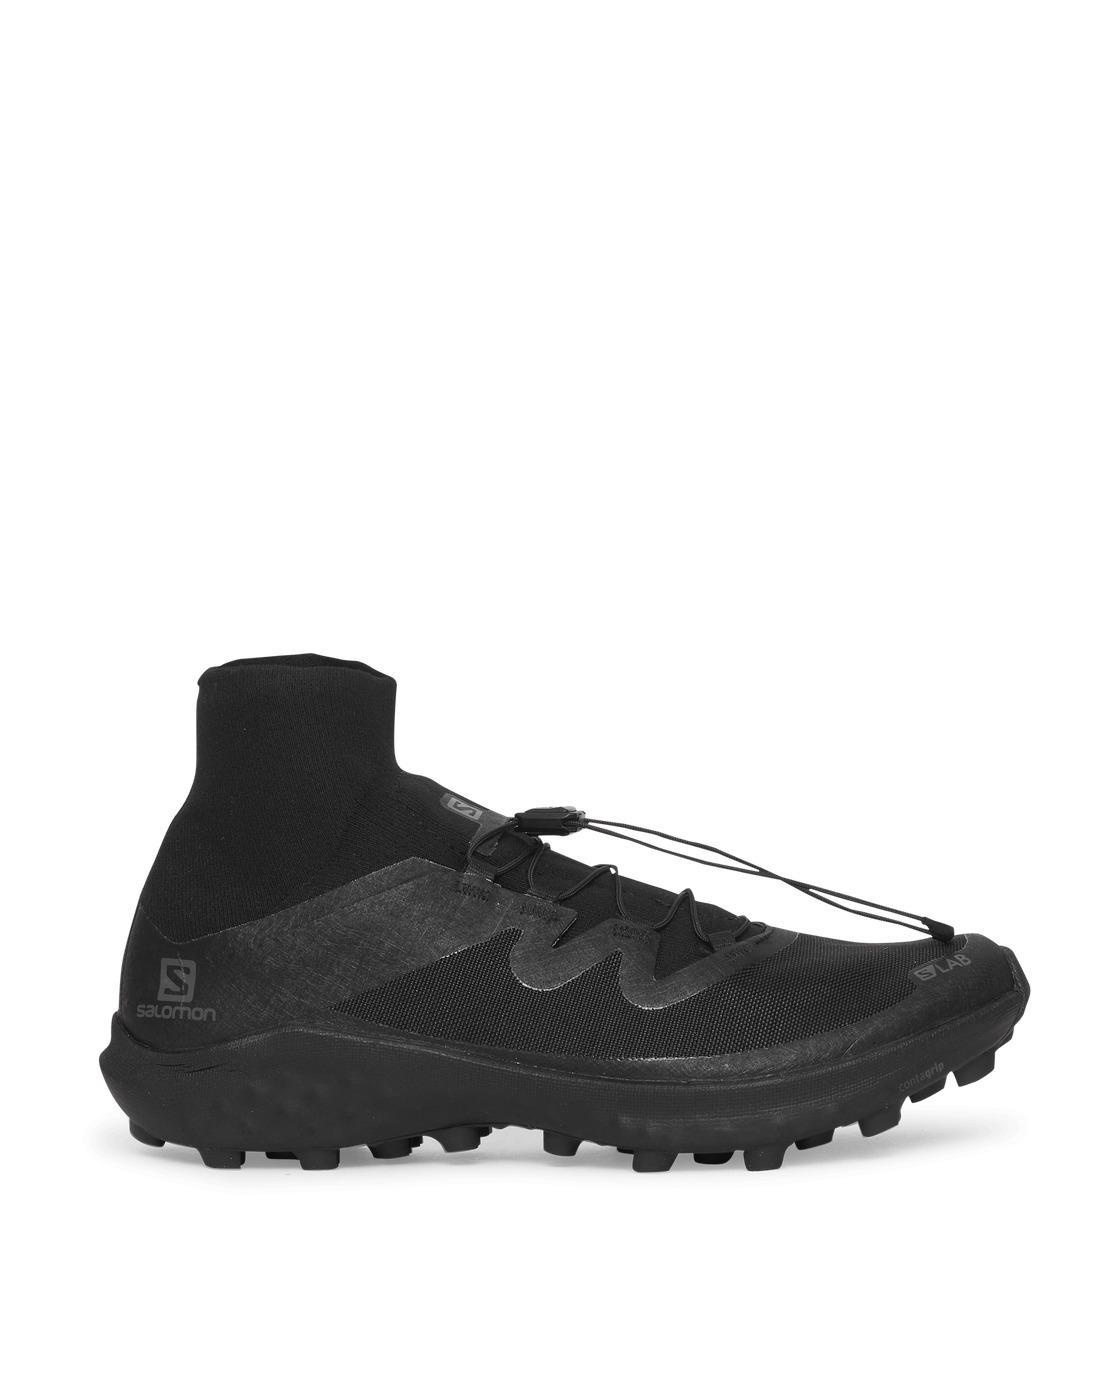 Photo: Salomon S/Lab Cross Black Ltd Sneakers Black/Black